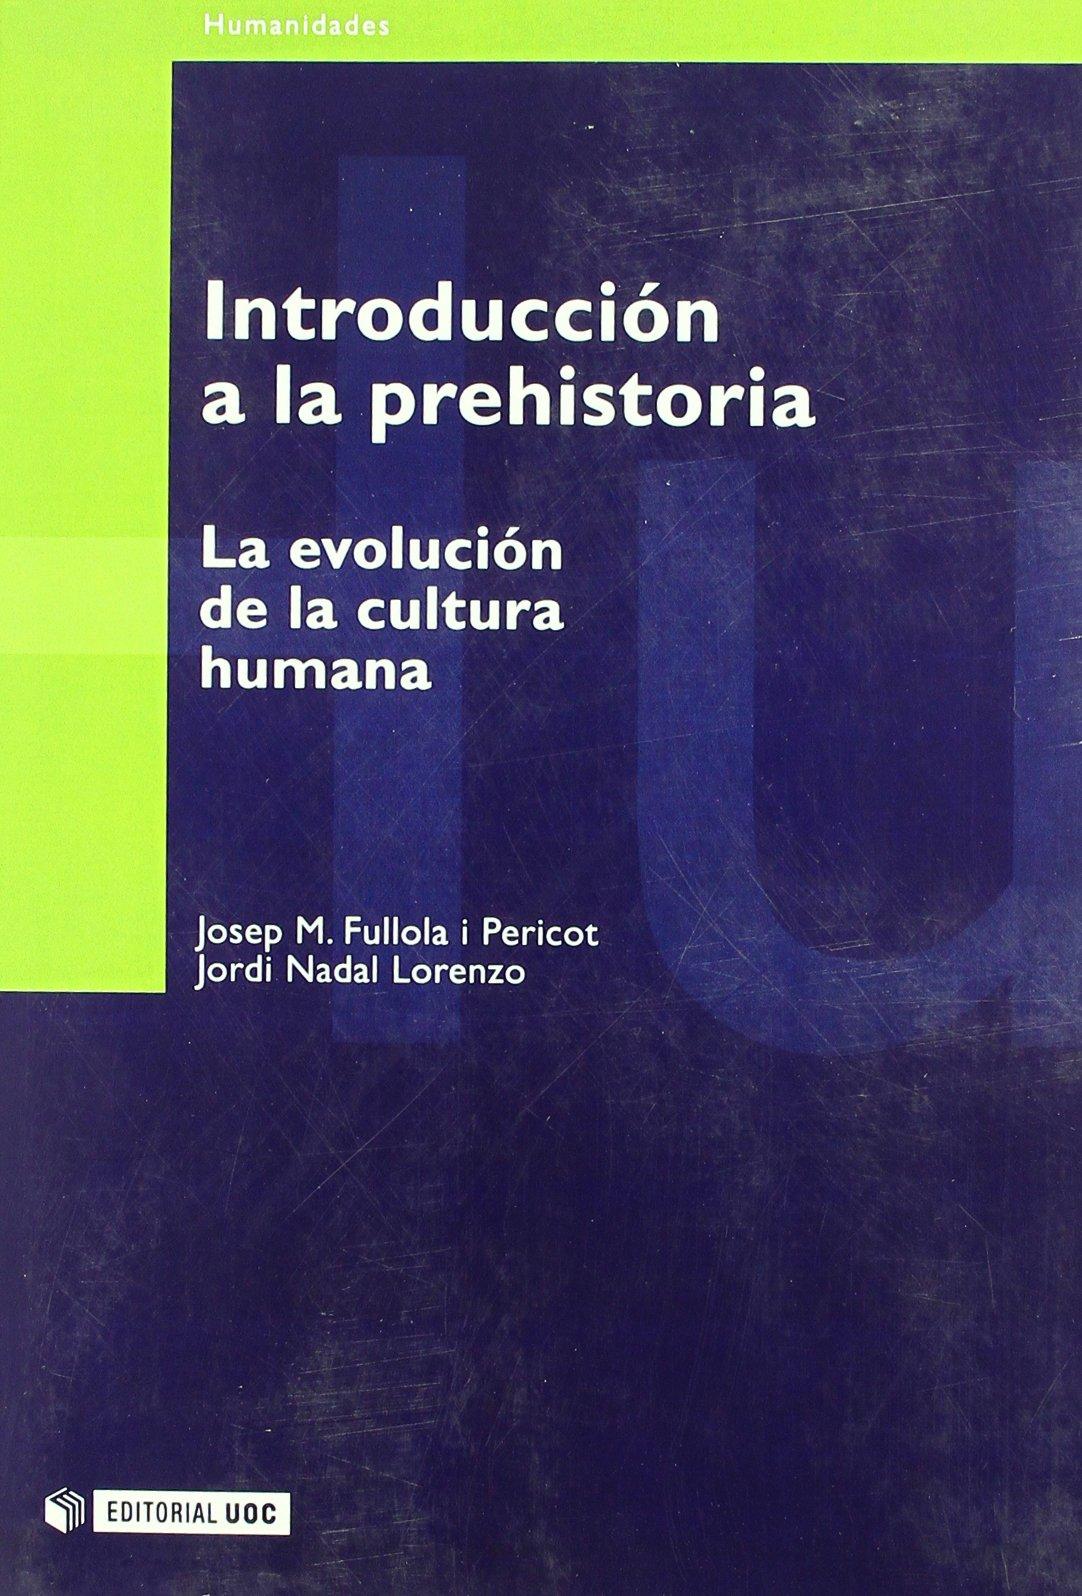 Introducción a la prehistoria: La evolución de la cultura humana Manuales: Amazon.es: Josep M. Fullola i Pericot, Jordi Nadal Lorenzo: Libros